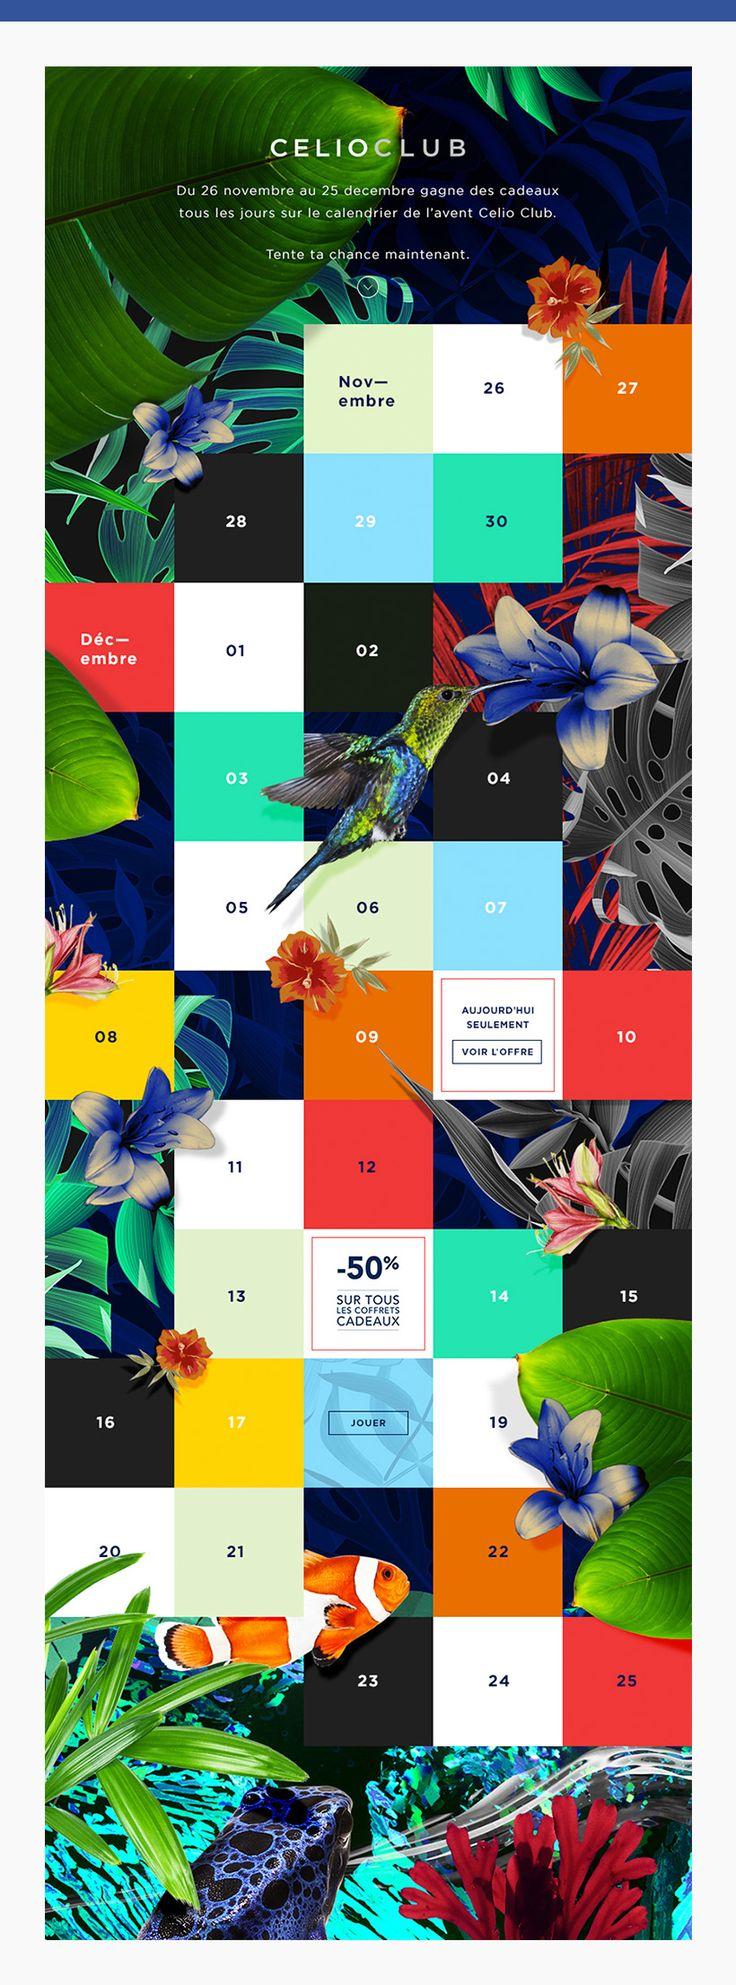 celioclub facebook tropical perroquet website graphisme